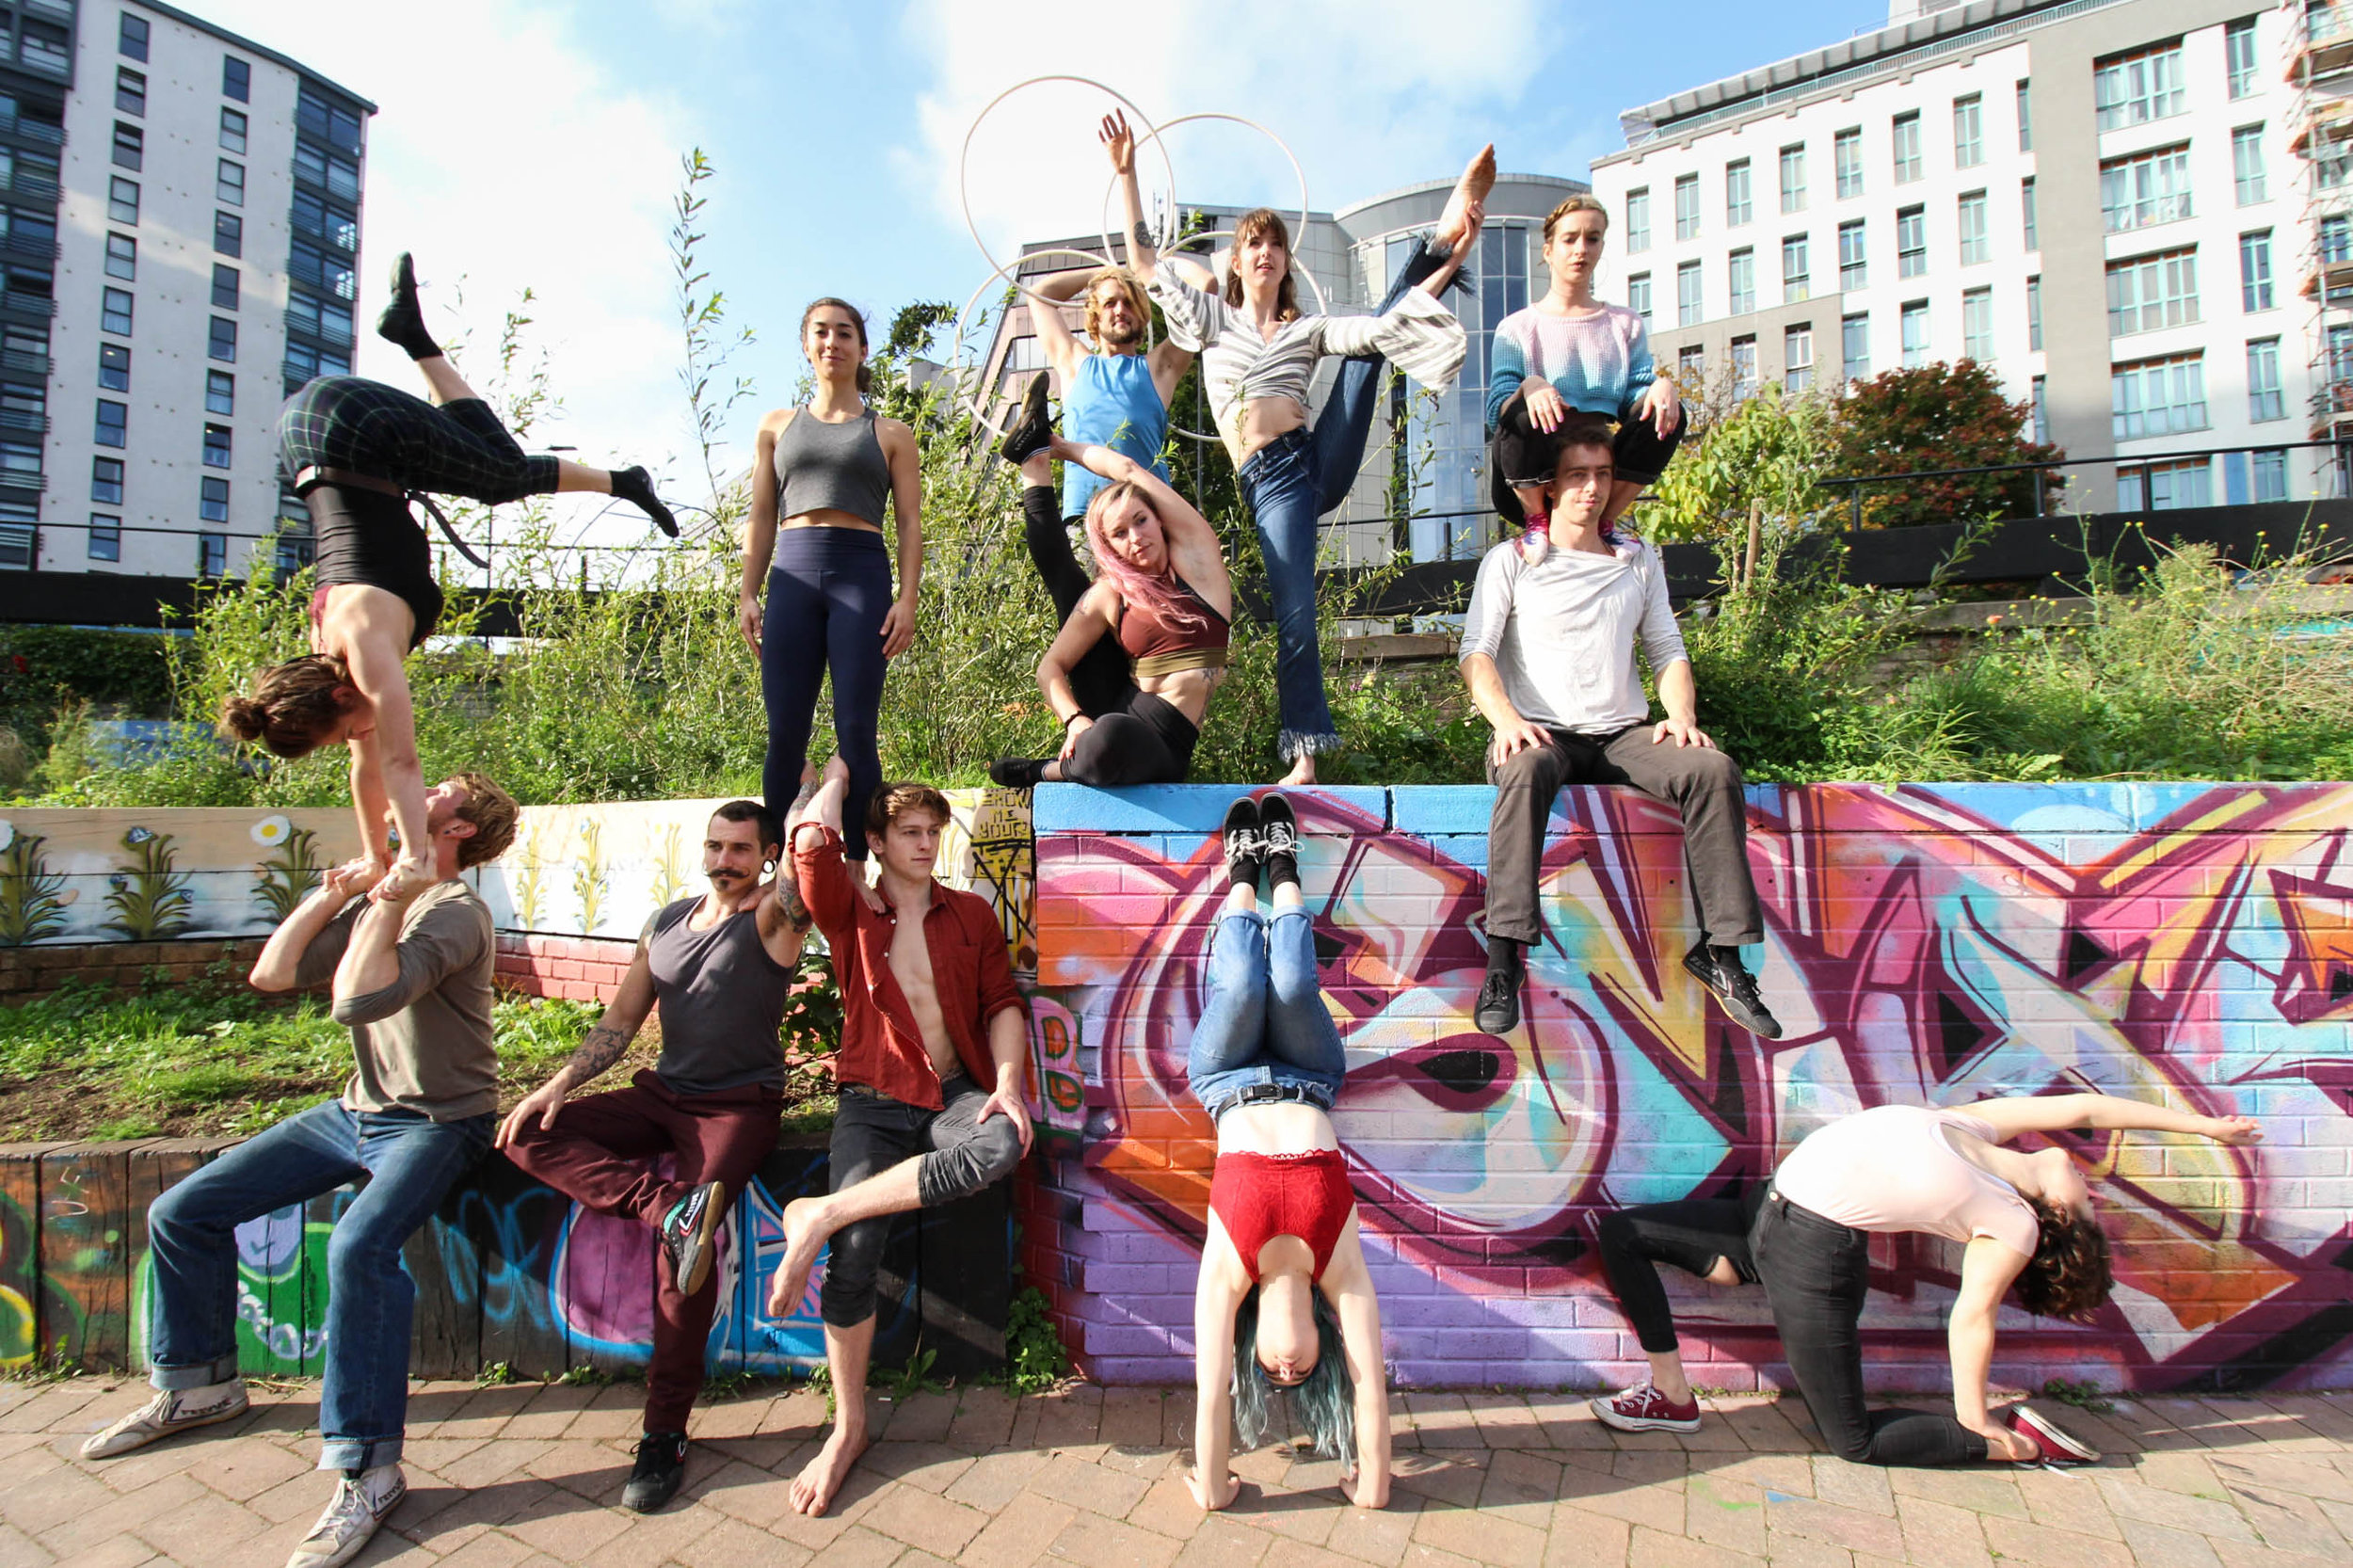 Circomedia showcase - Cirque Bijou Circus Playground, Stage - photo Cynthia Price.jpg